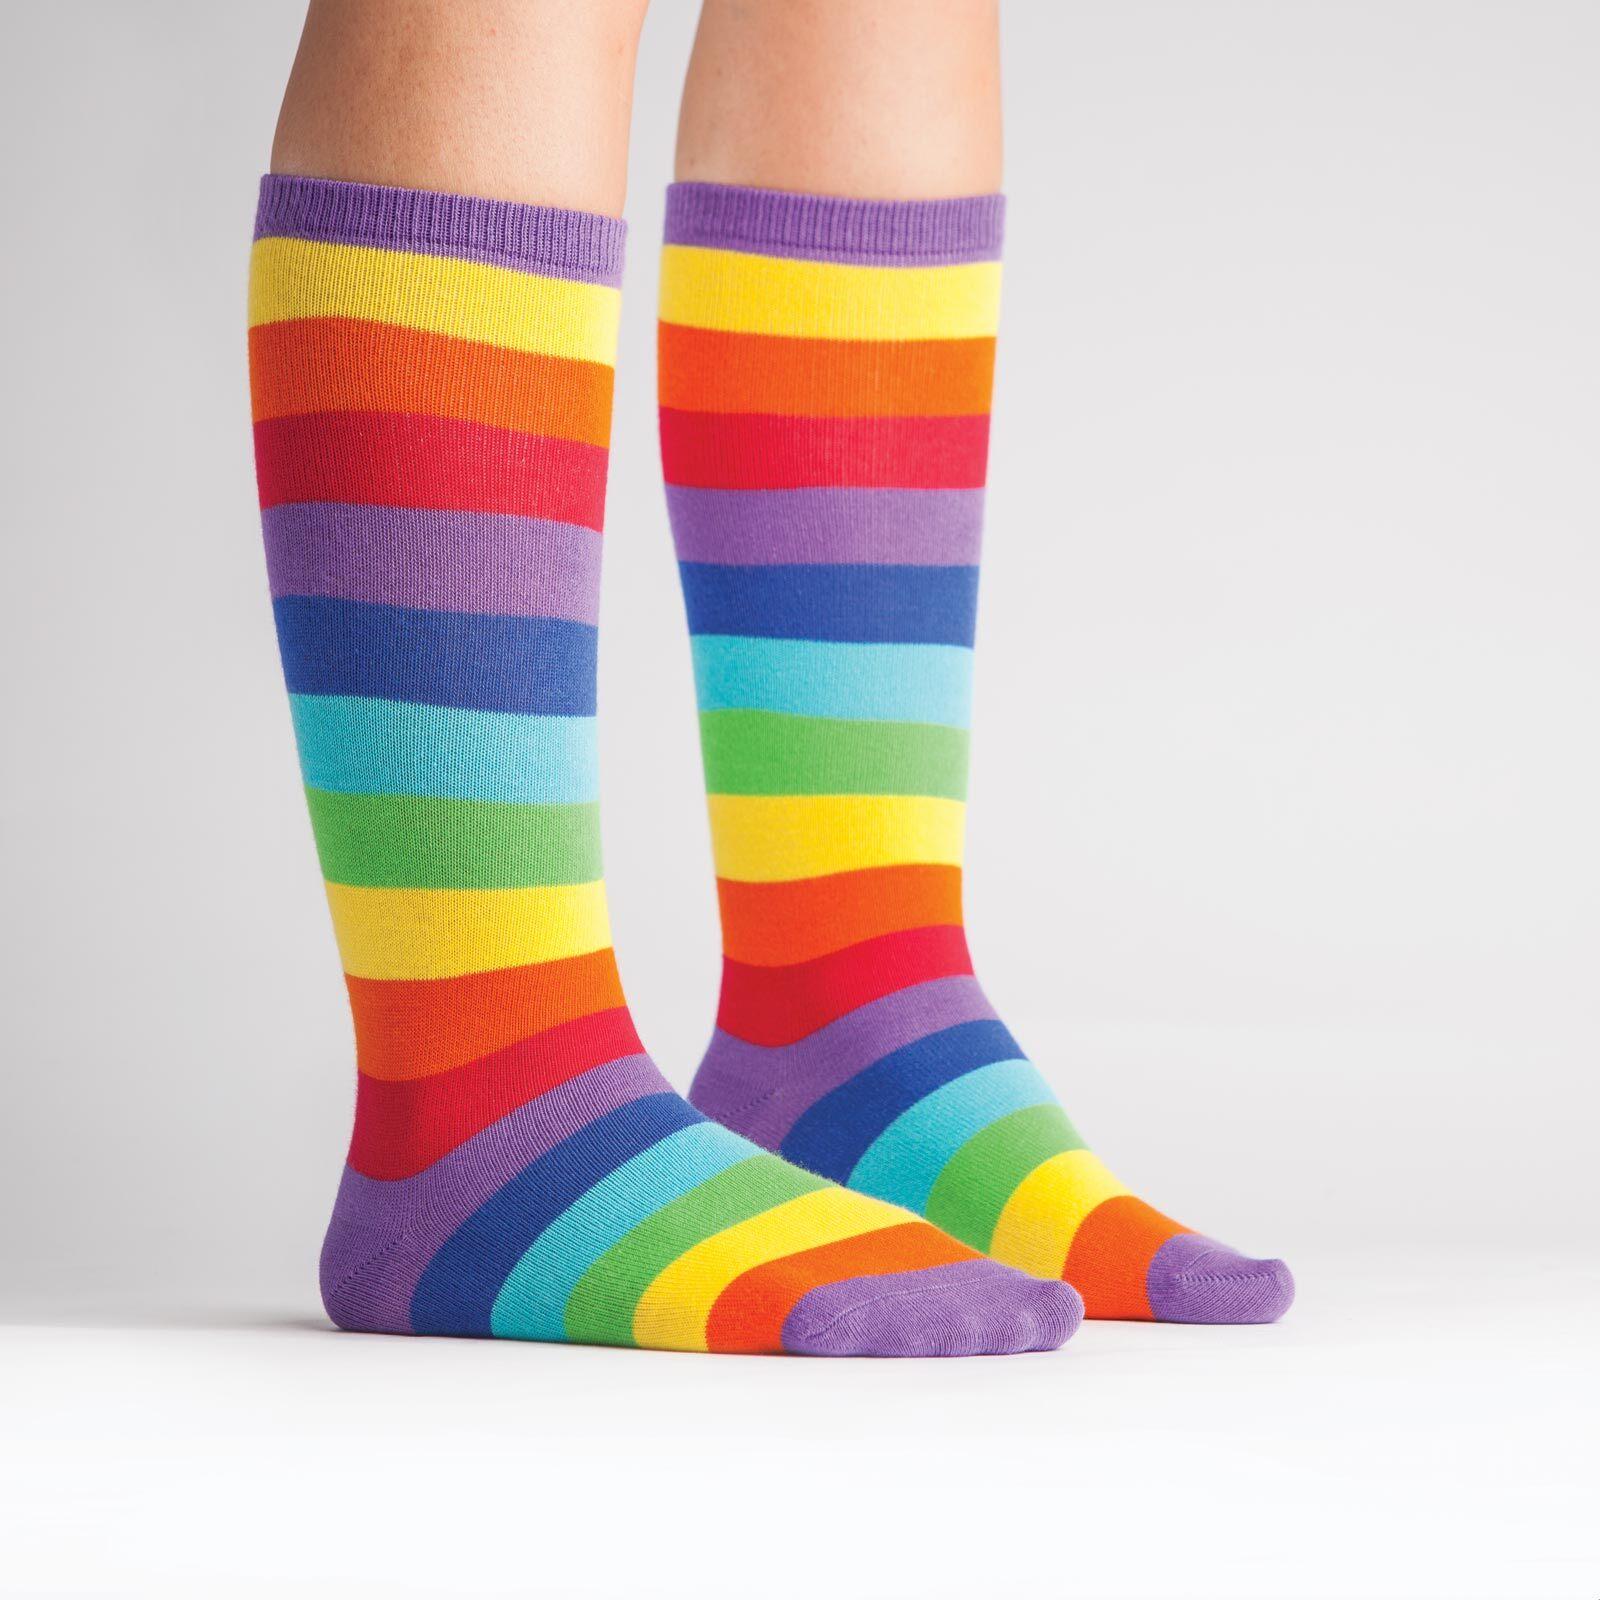 model wearing Super Juicy - Rainbow Knee High Socks - Youth